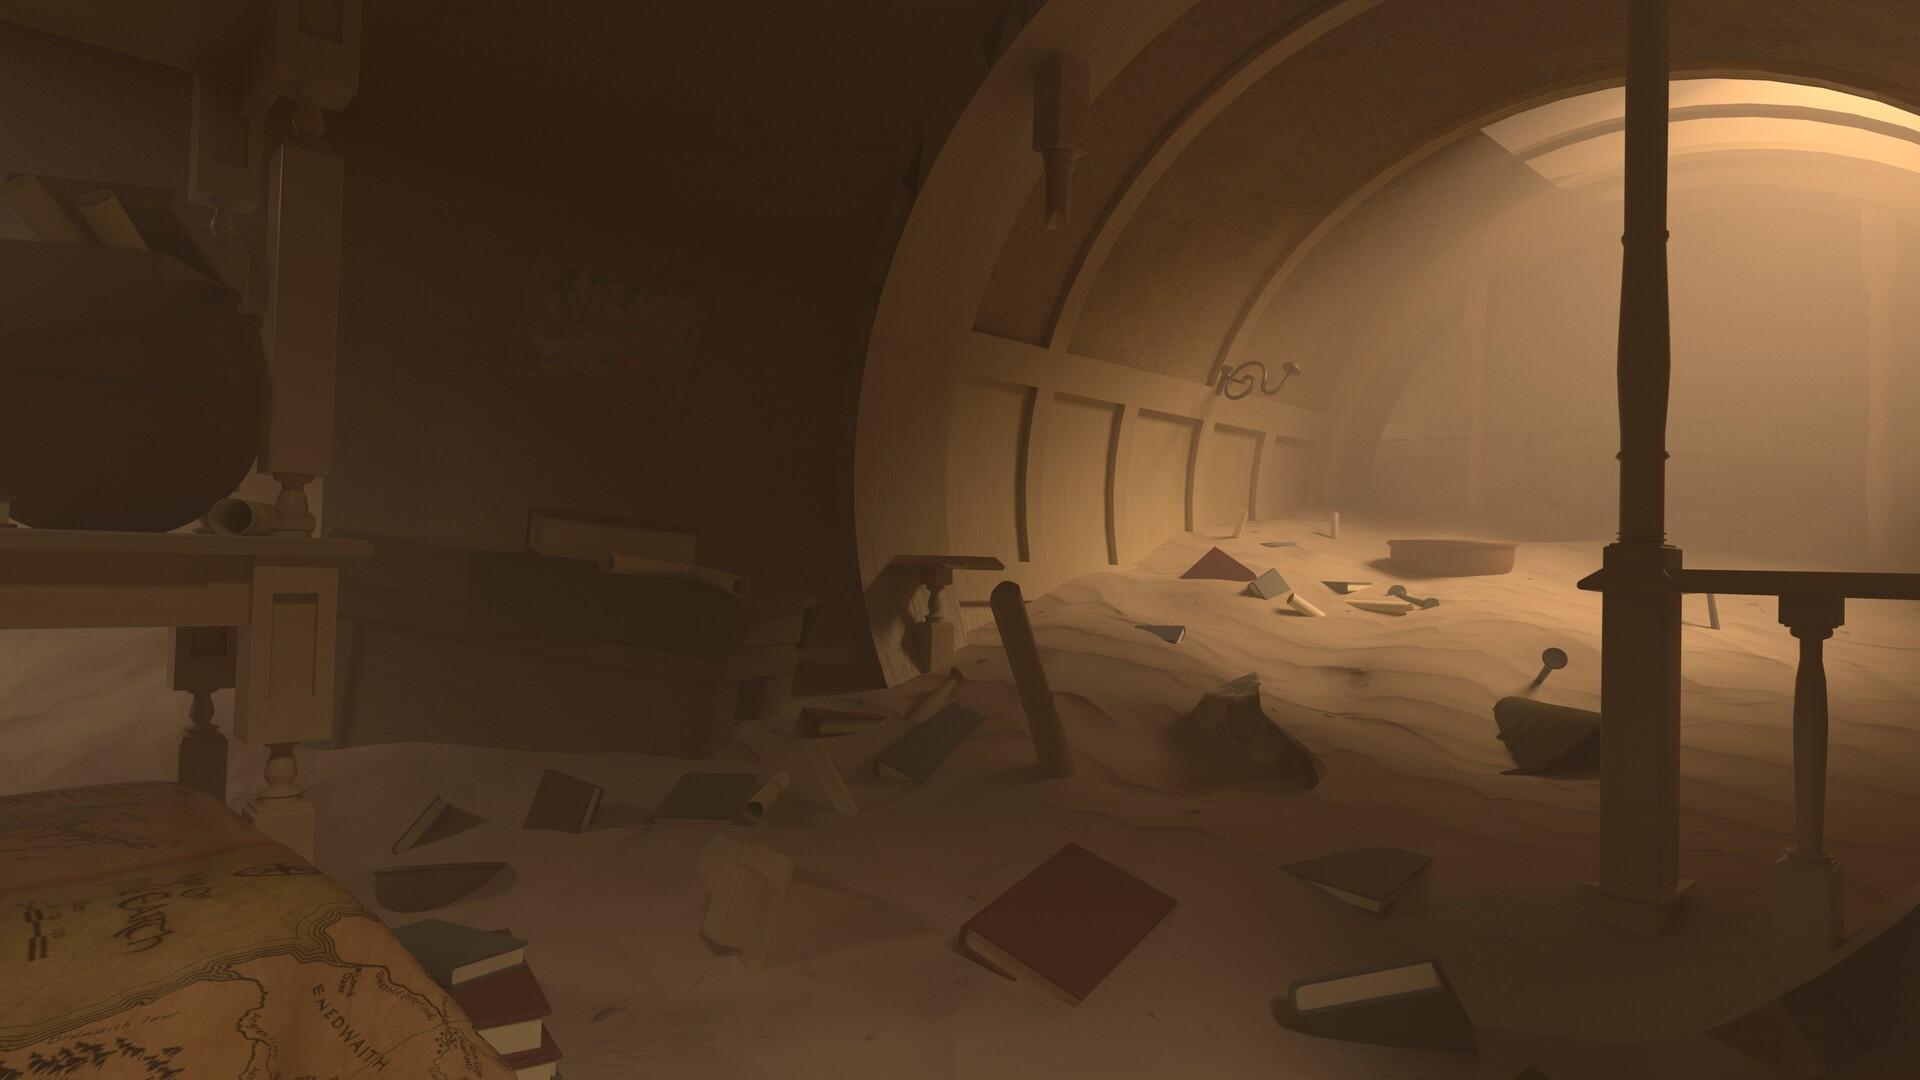 Tyler klimek hobbithole sandstorm 4kcamera01